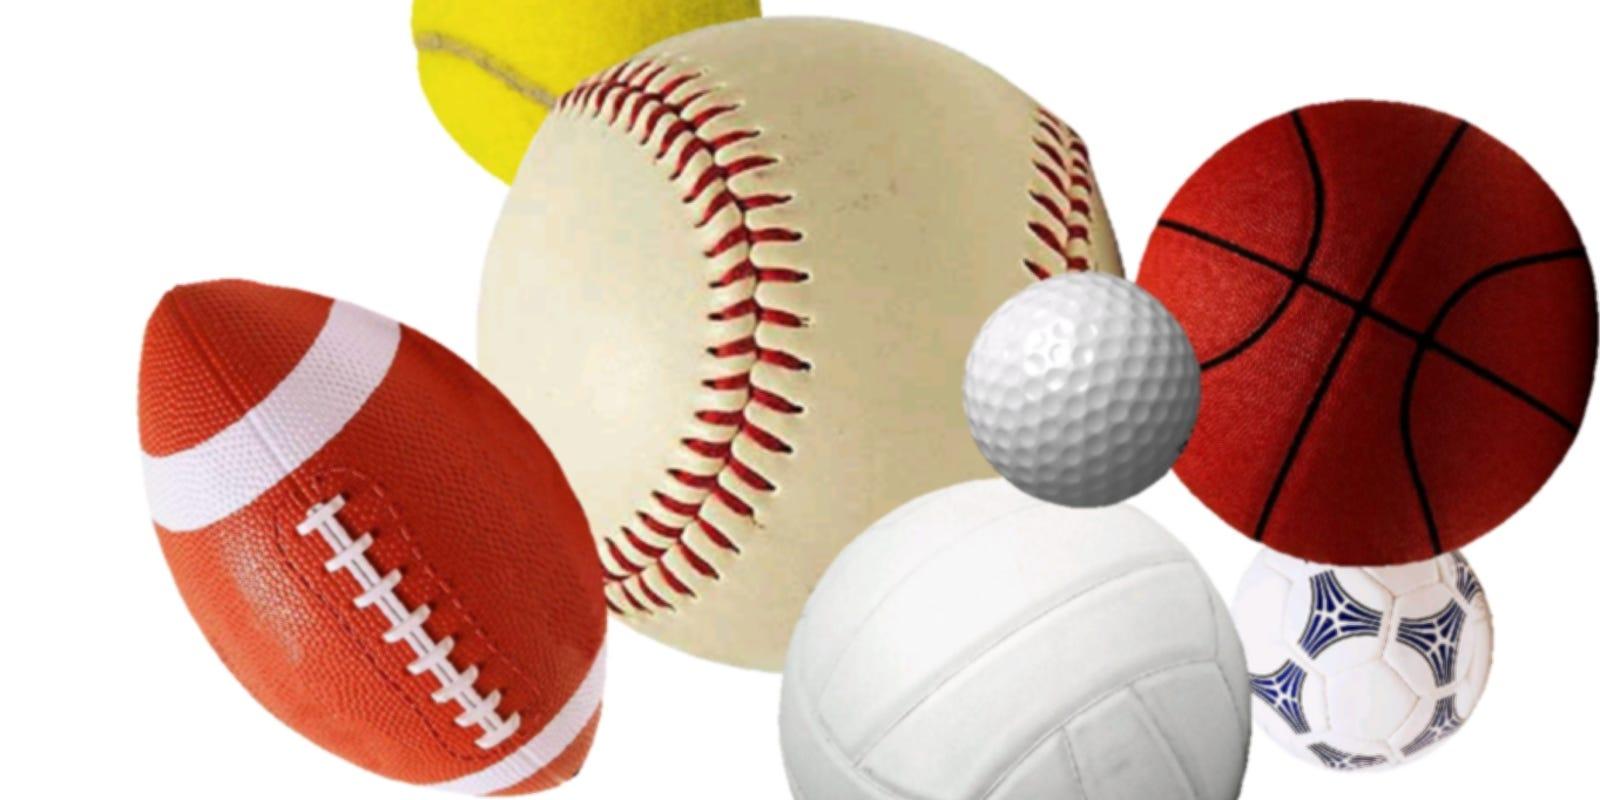 1378810507000-balls2